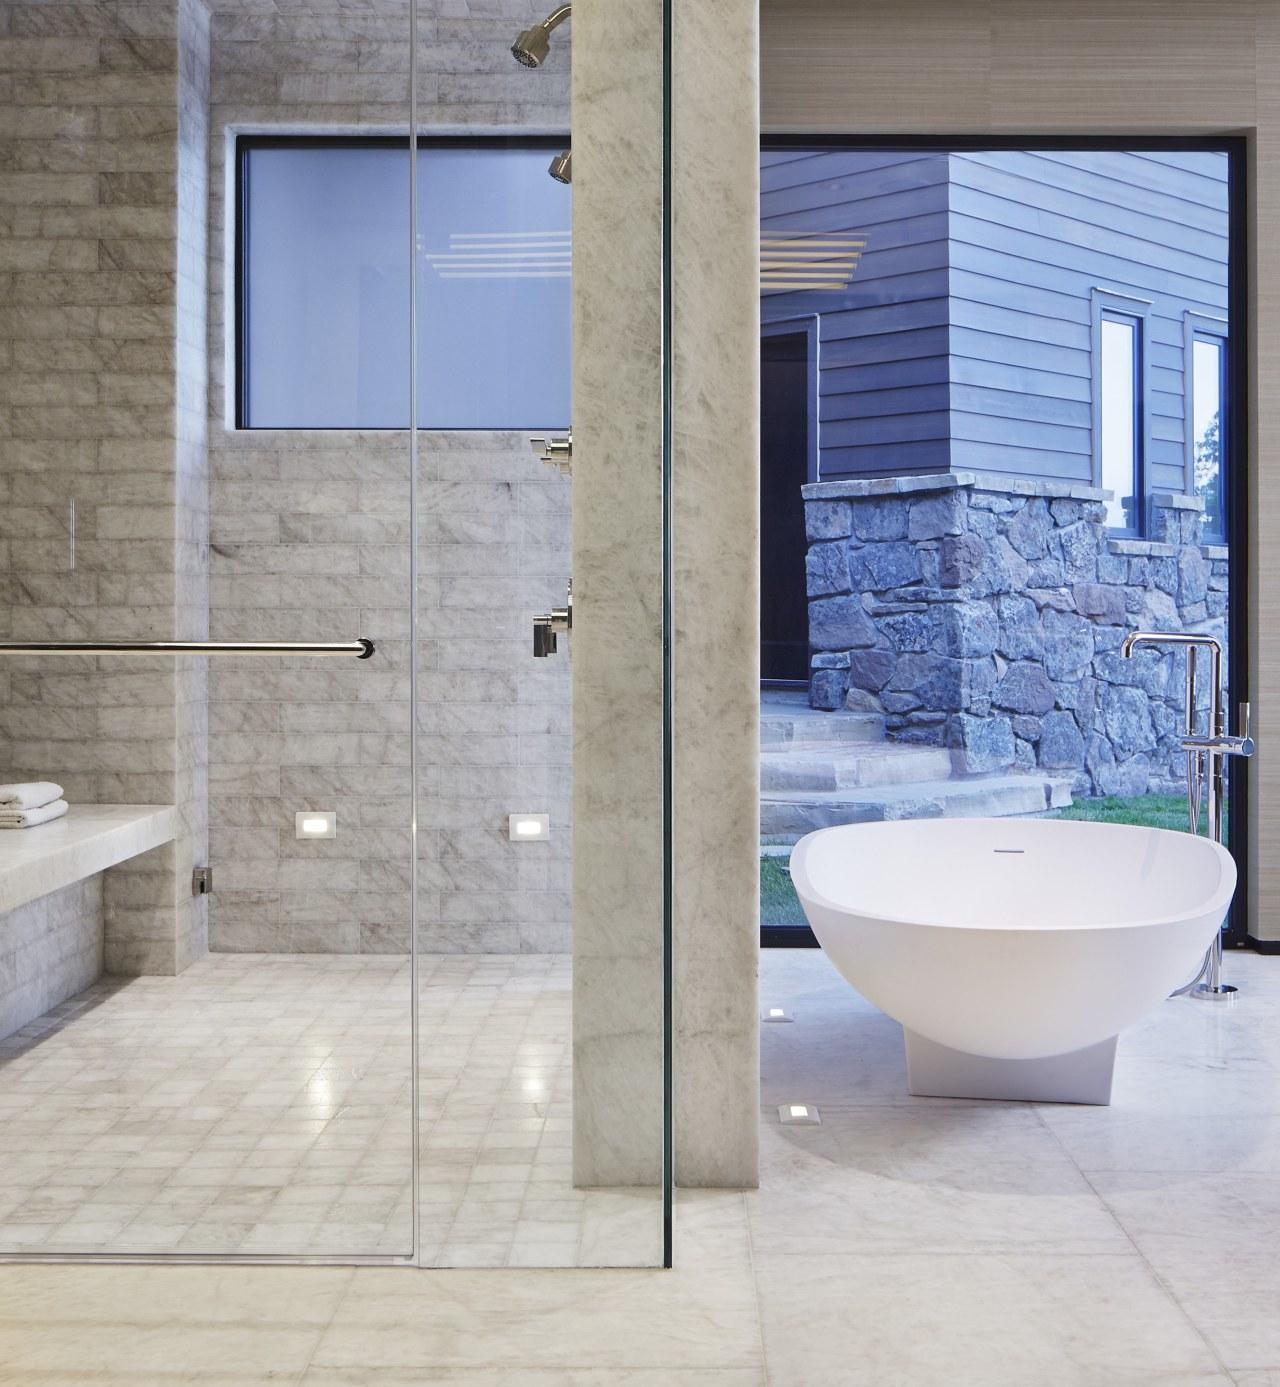 Four different formats of brushed Iceberg Quartzite tiles architecture, bathroom, floor, flooring, interior design, plumbing fixture, tap, tile, wall, gray